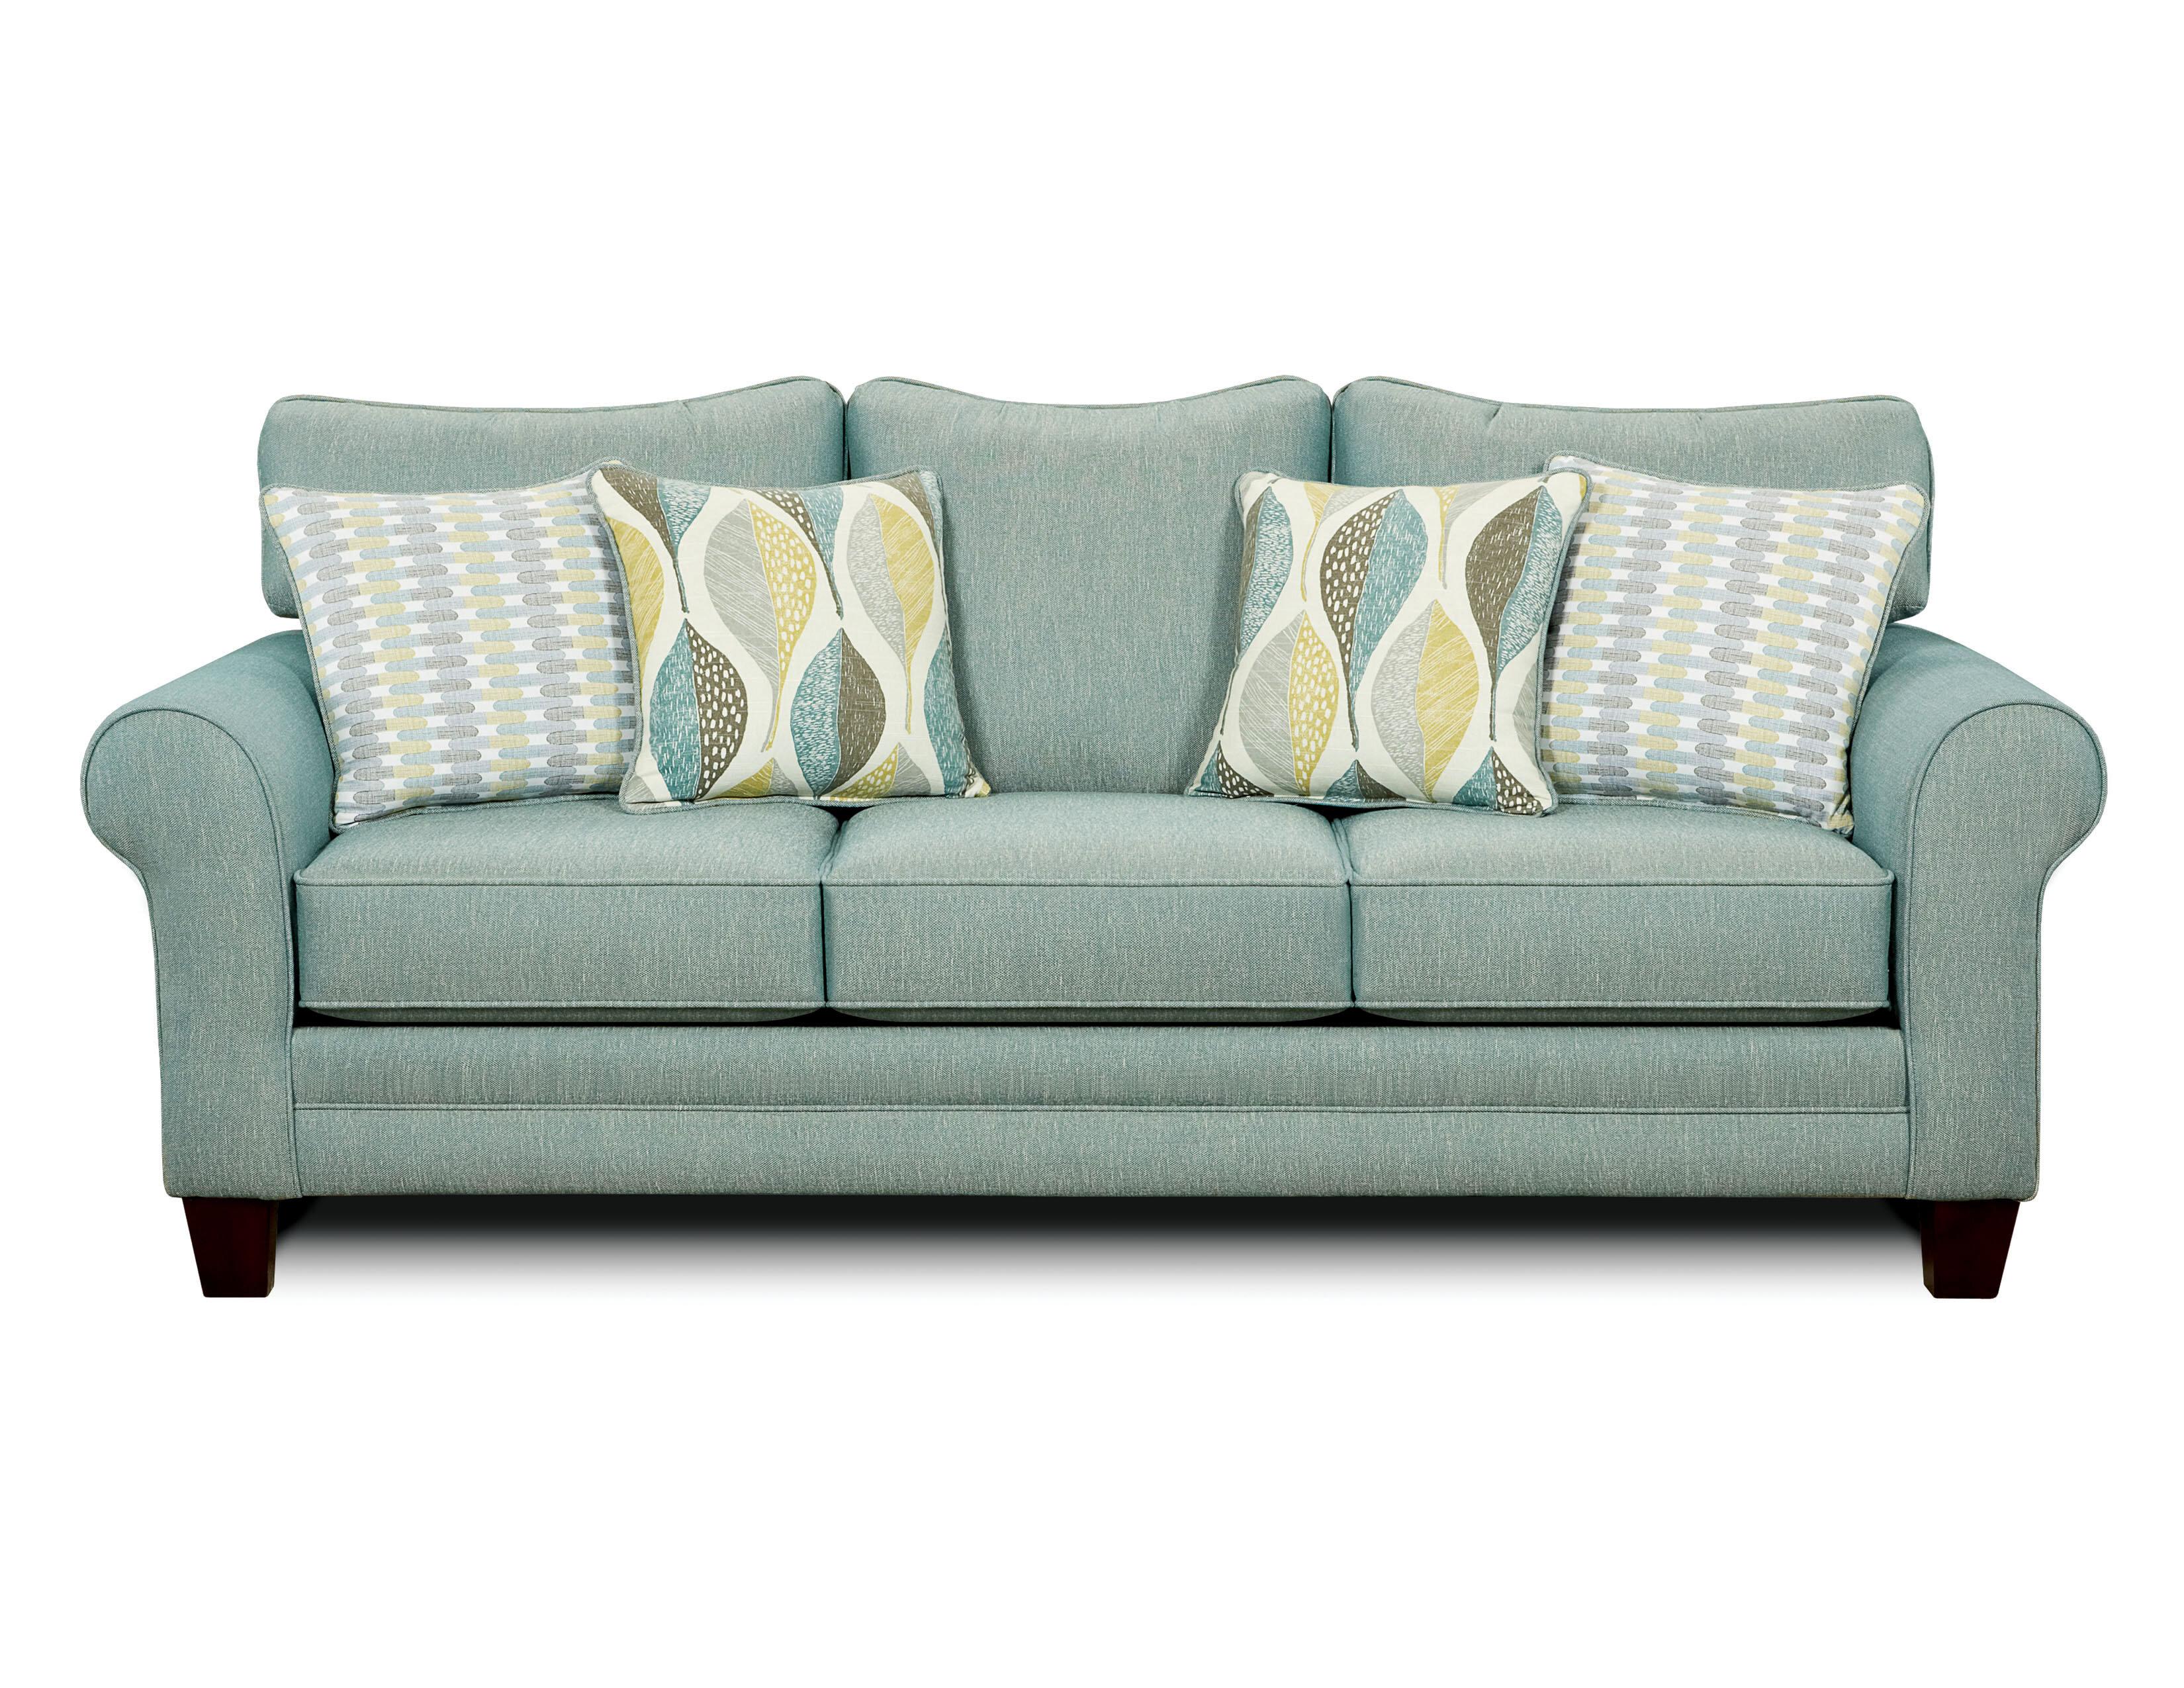 Hokku Designs Primavera Upholstered Sofa | Wayfair